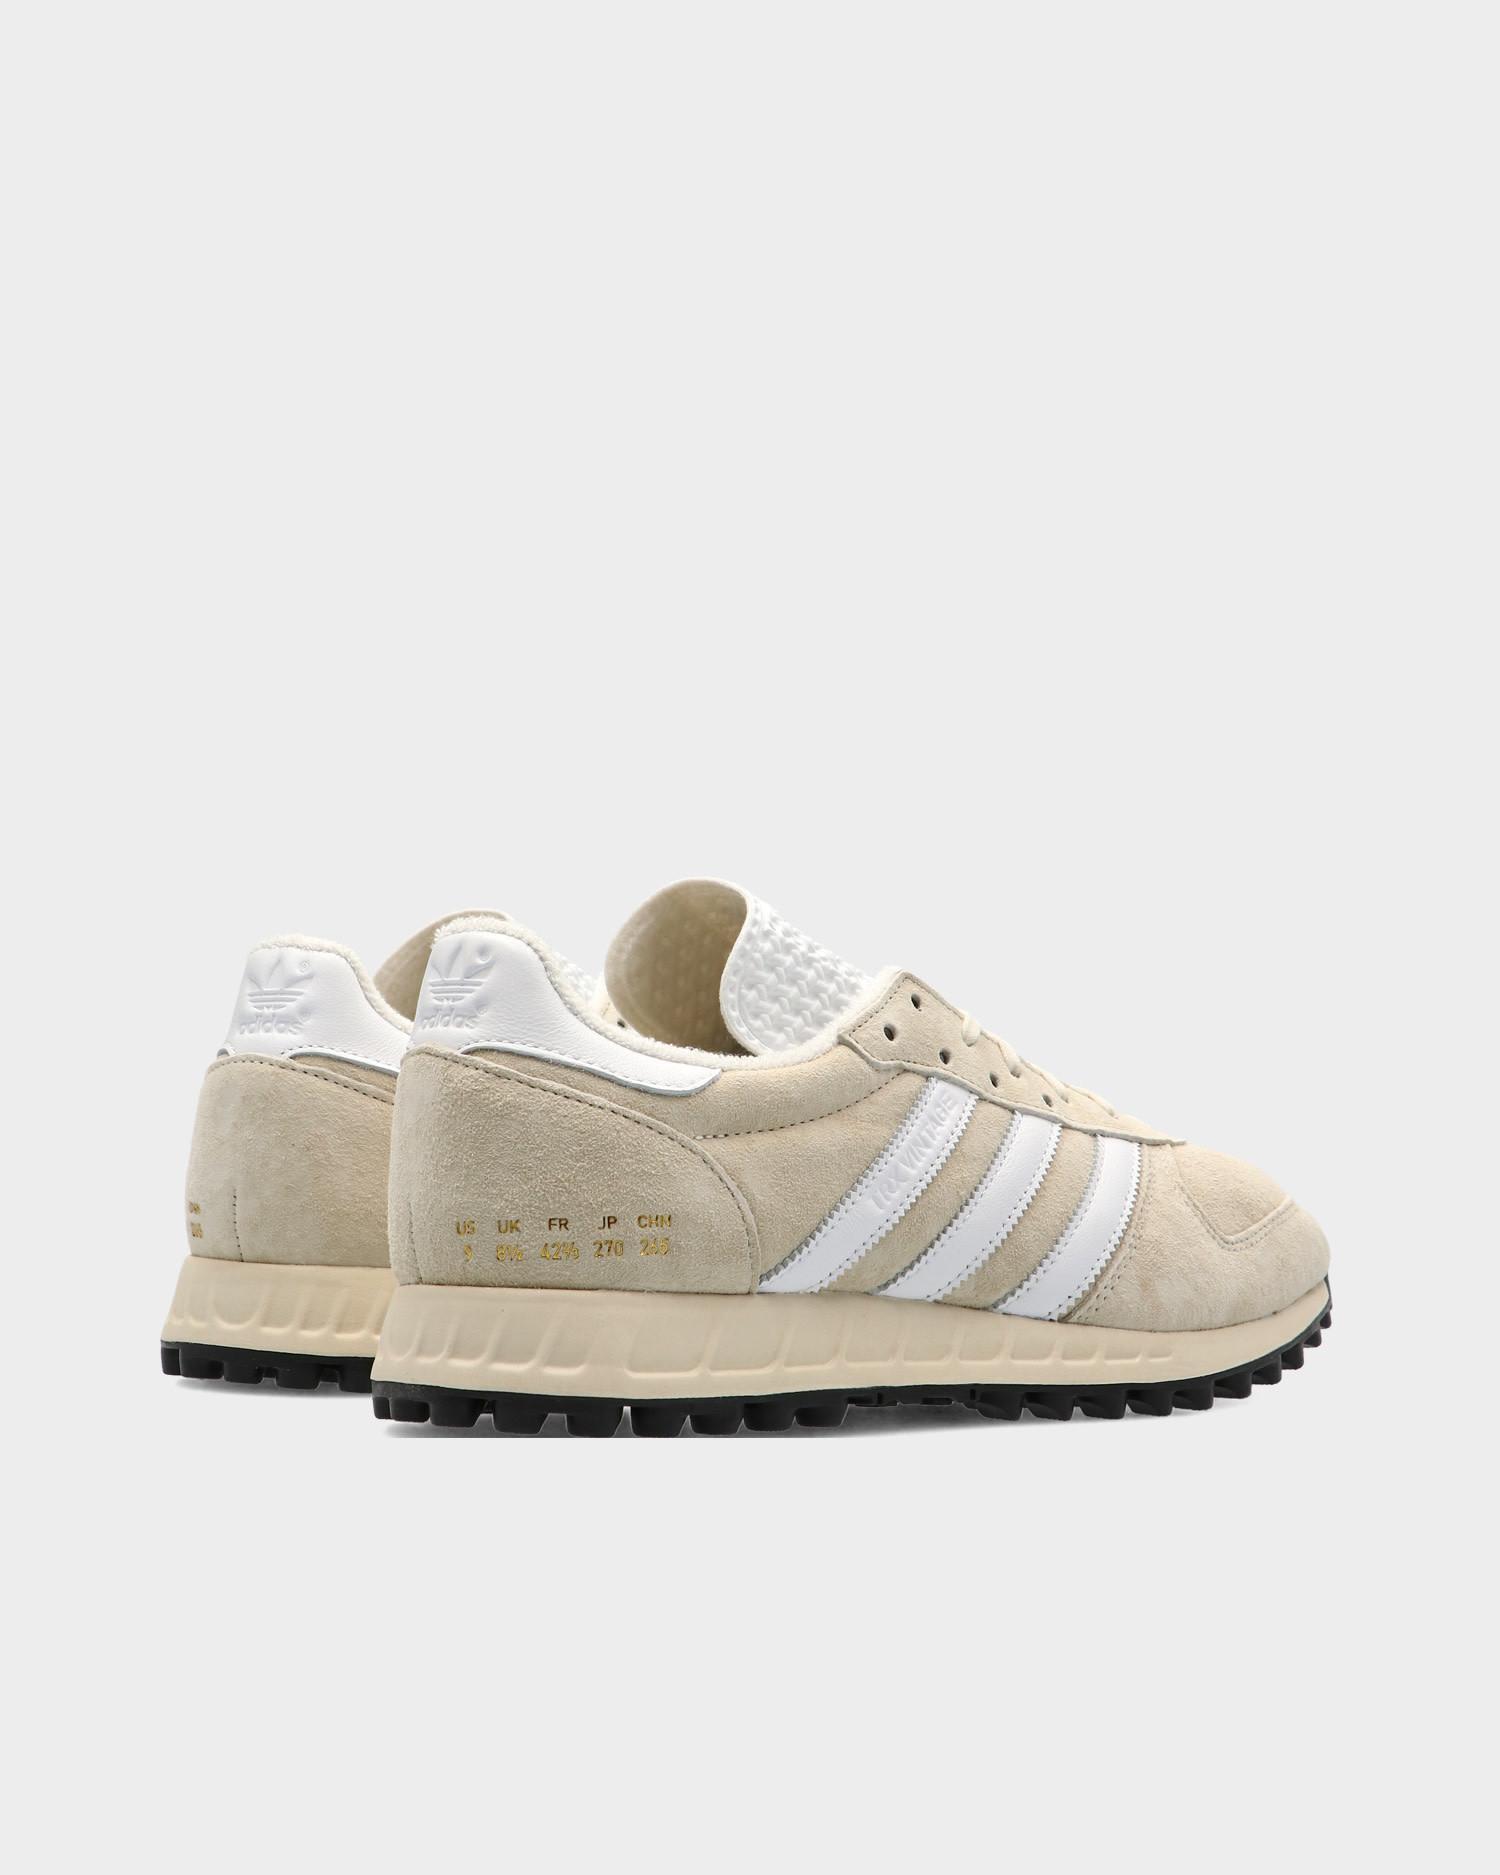 Adidas TRX Vintage Cwhite/Ftwwht/Cblack